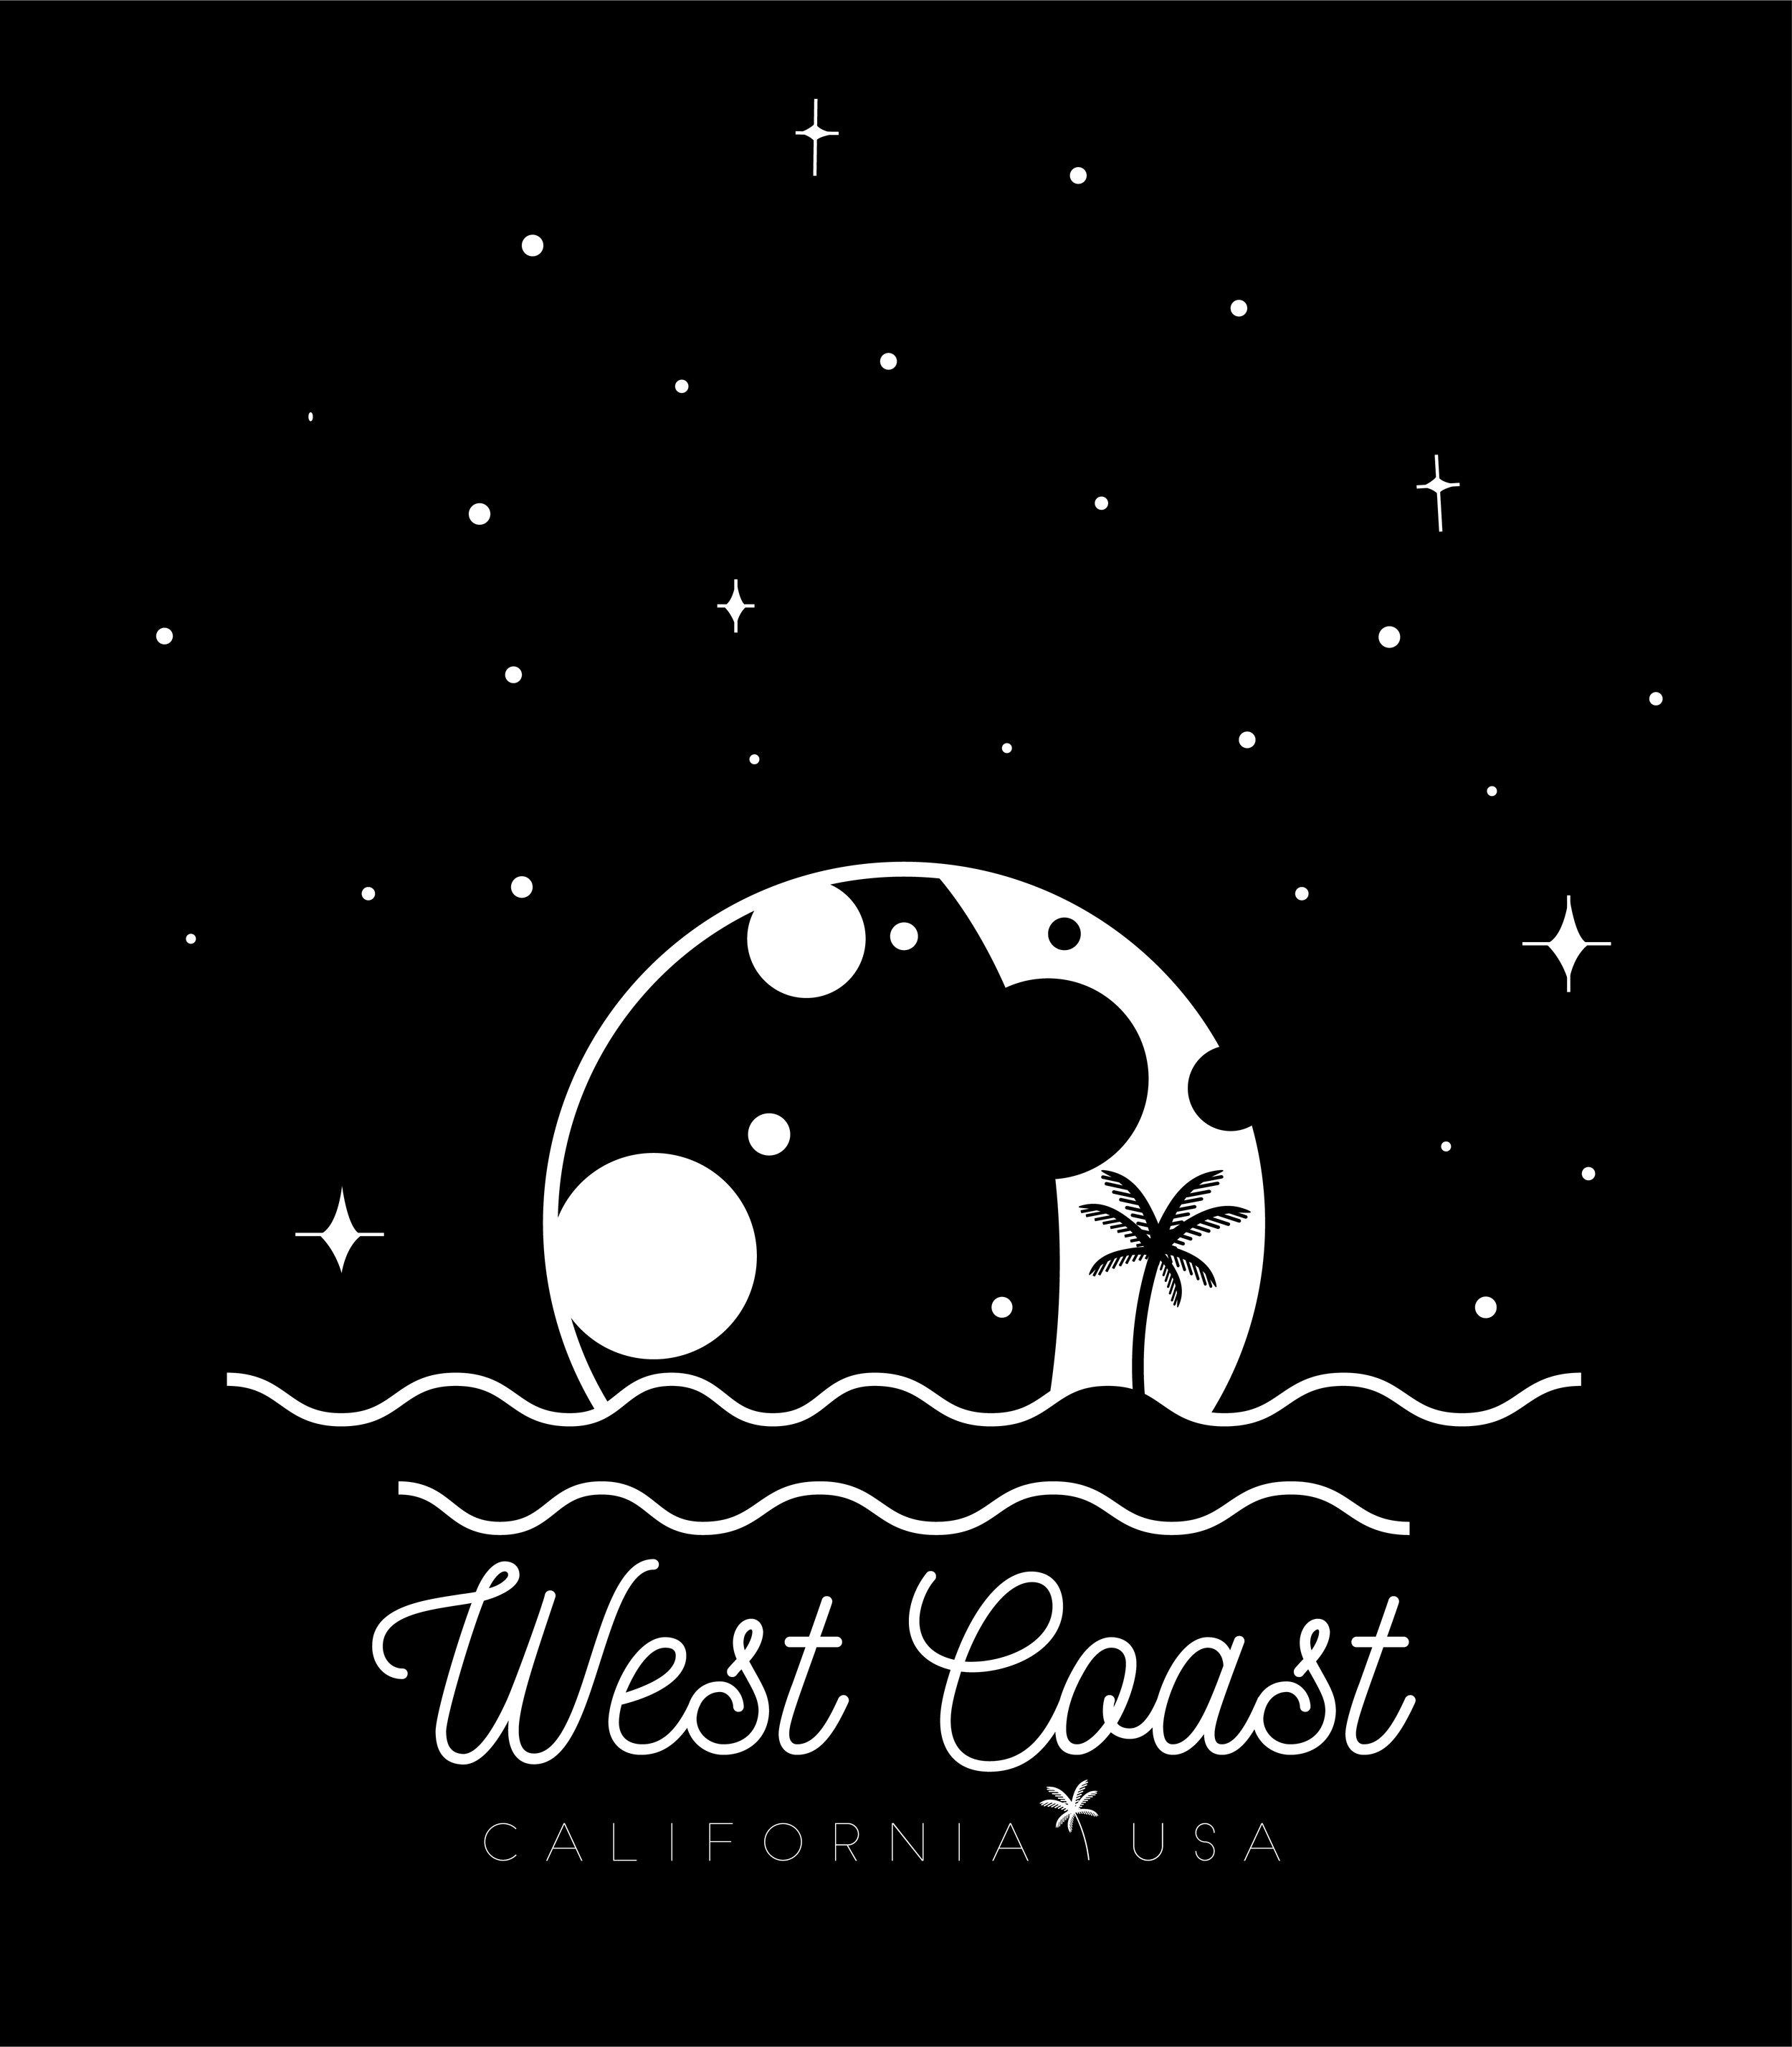 West Coast Moon-01.jpg